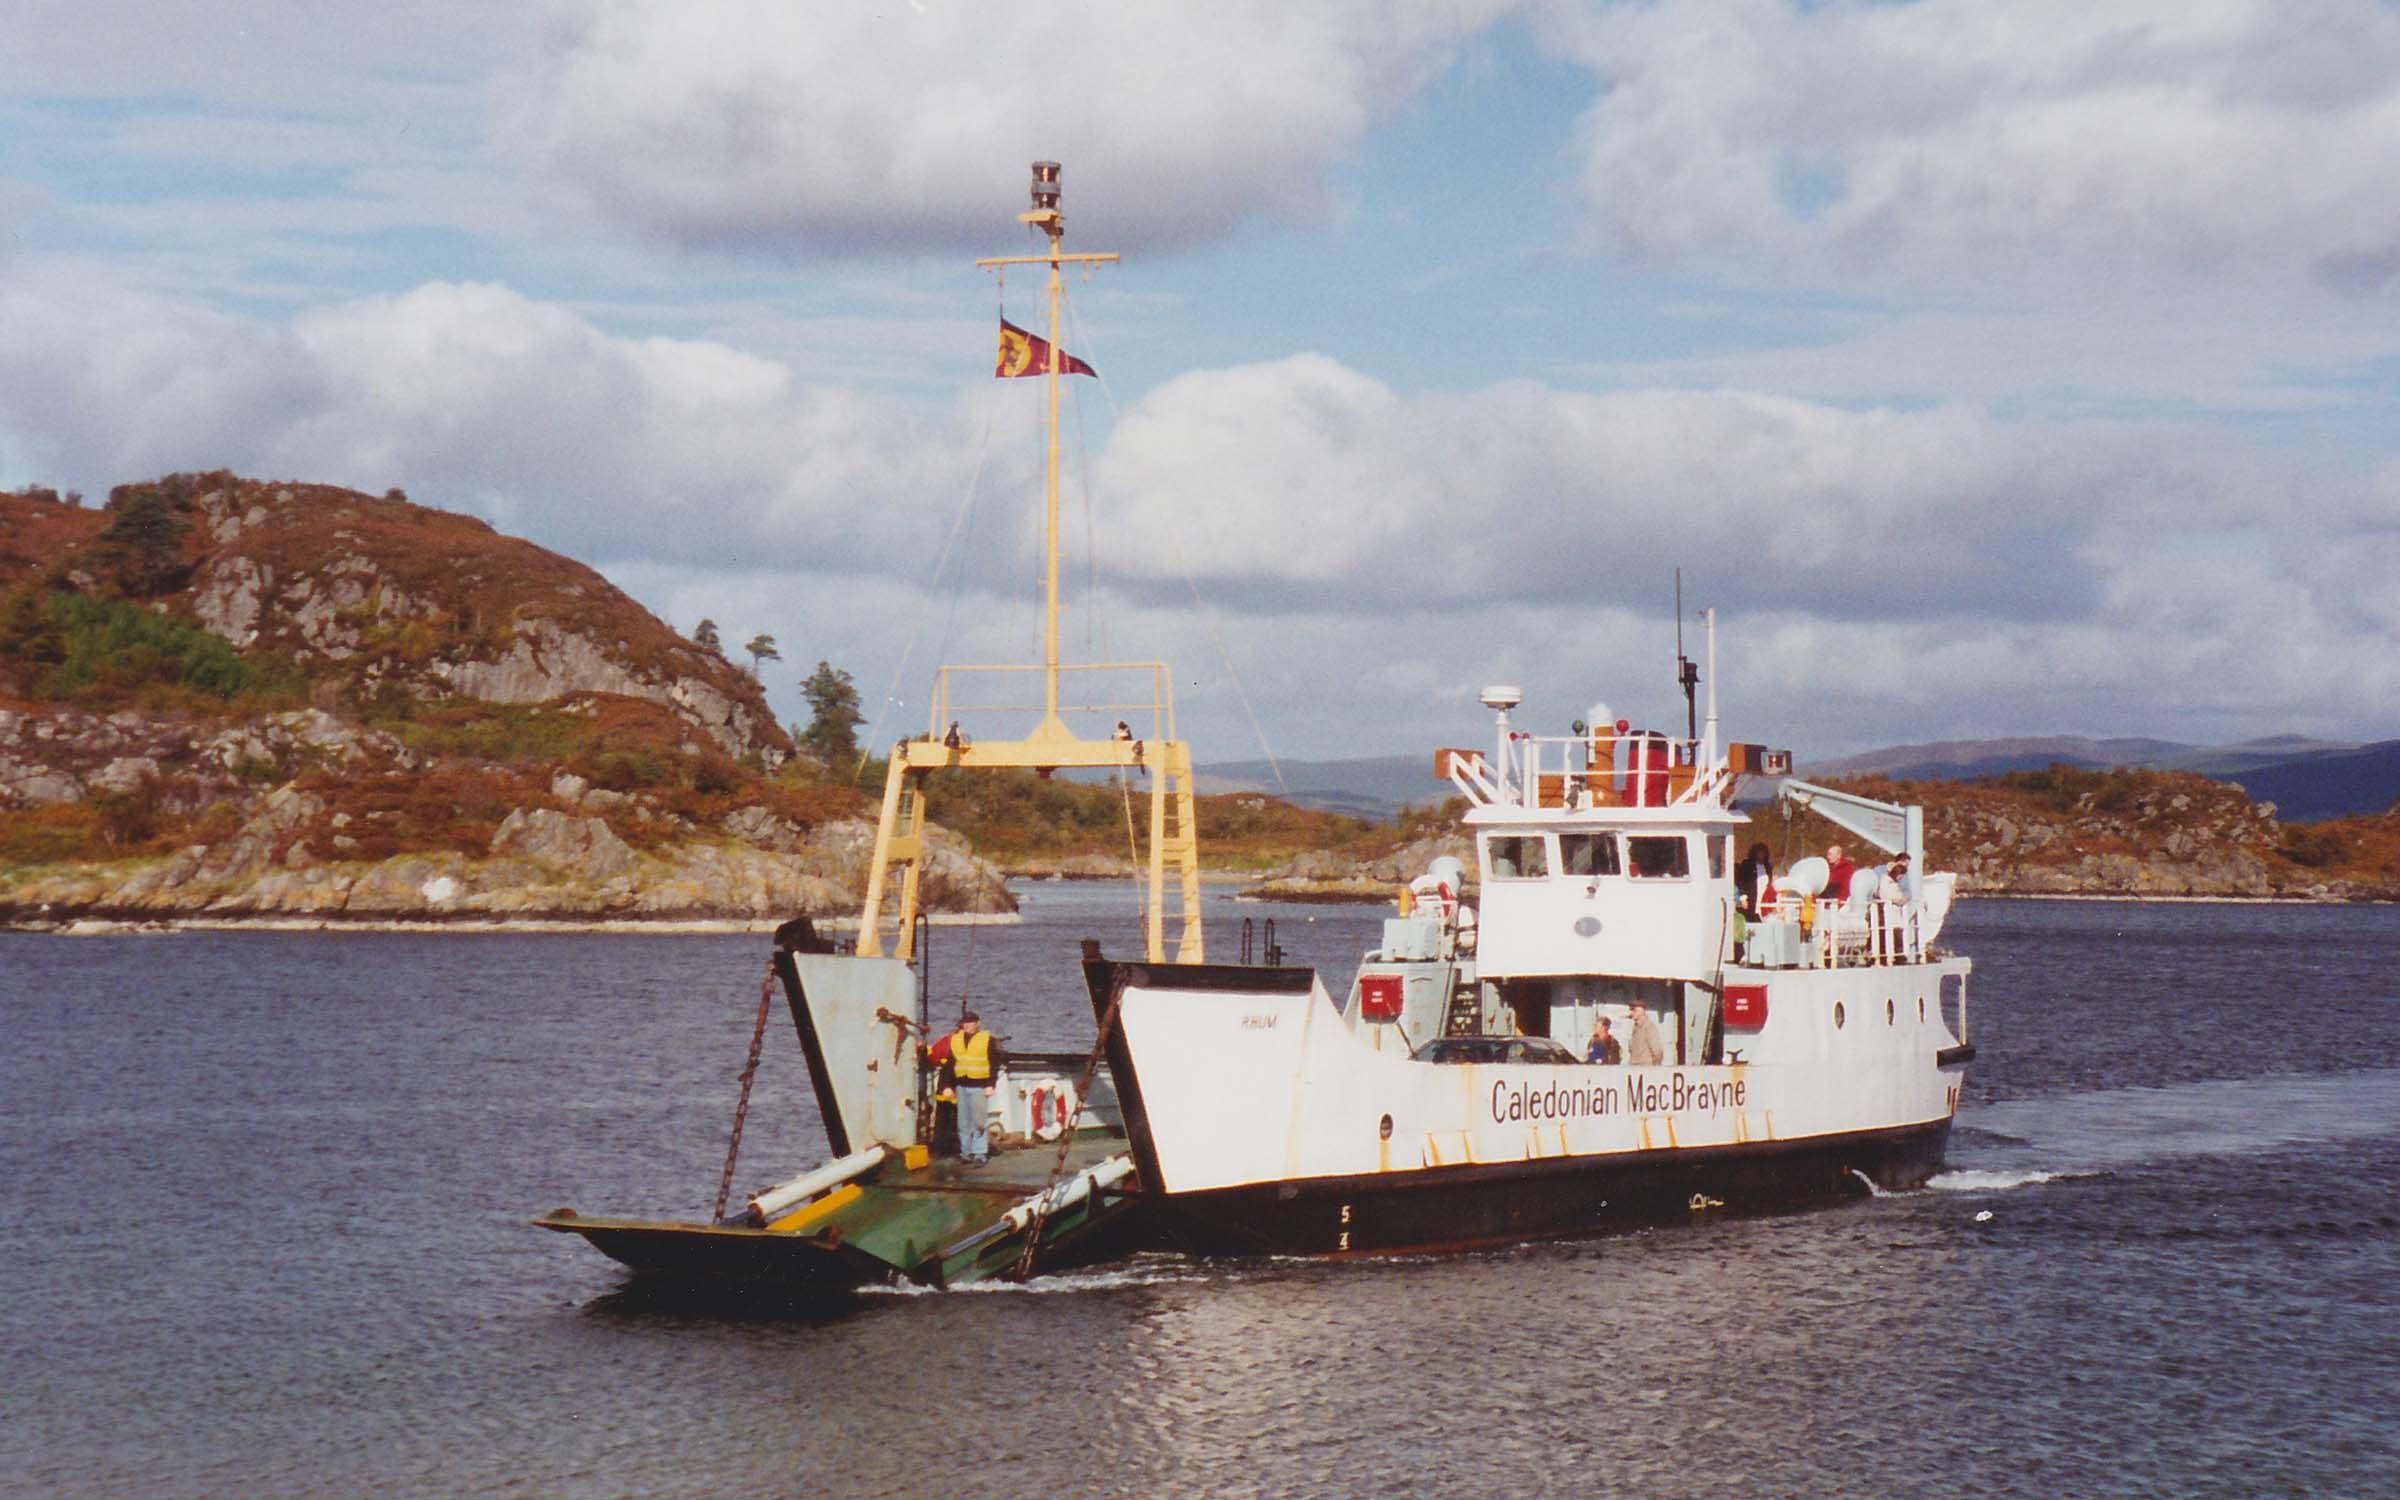 Rhum arriving at Tarbert, Loch Fyne (Ships of CalMac)